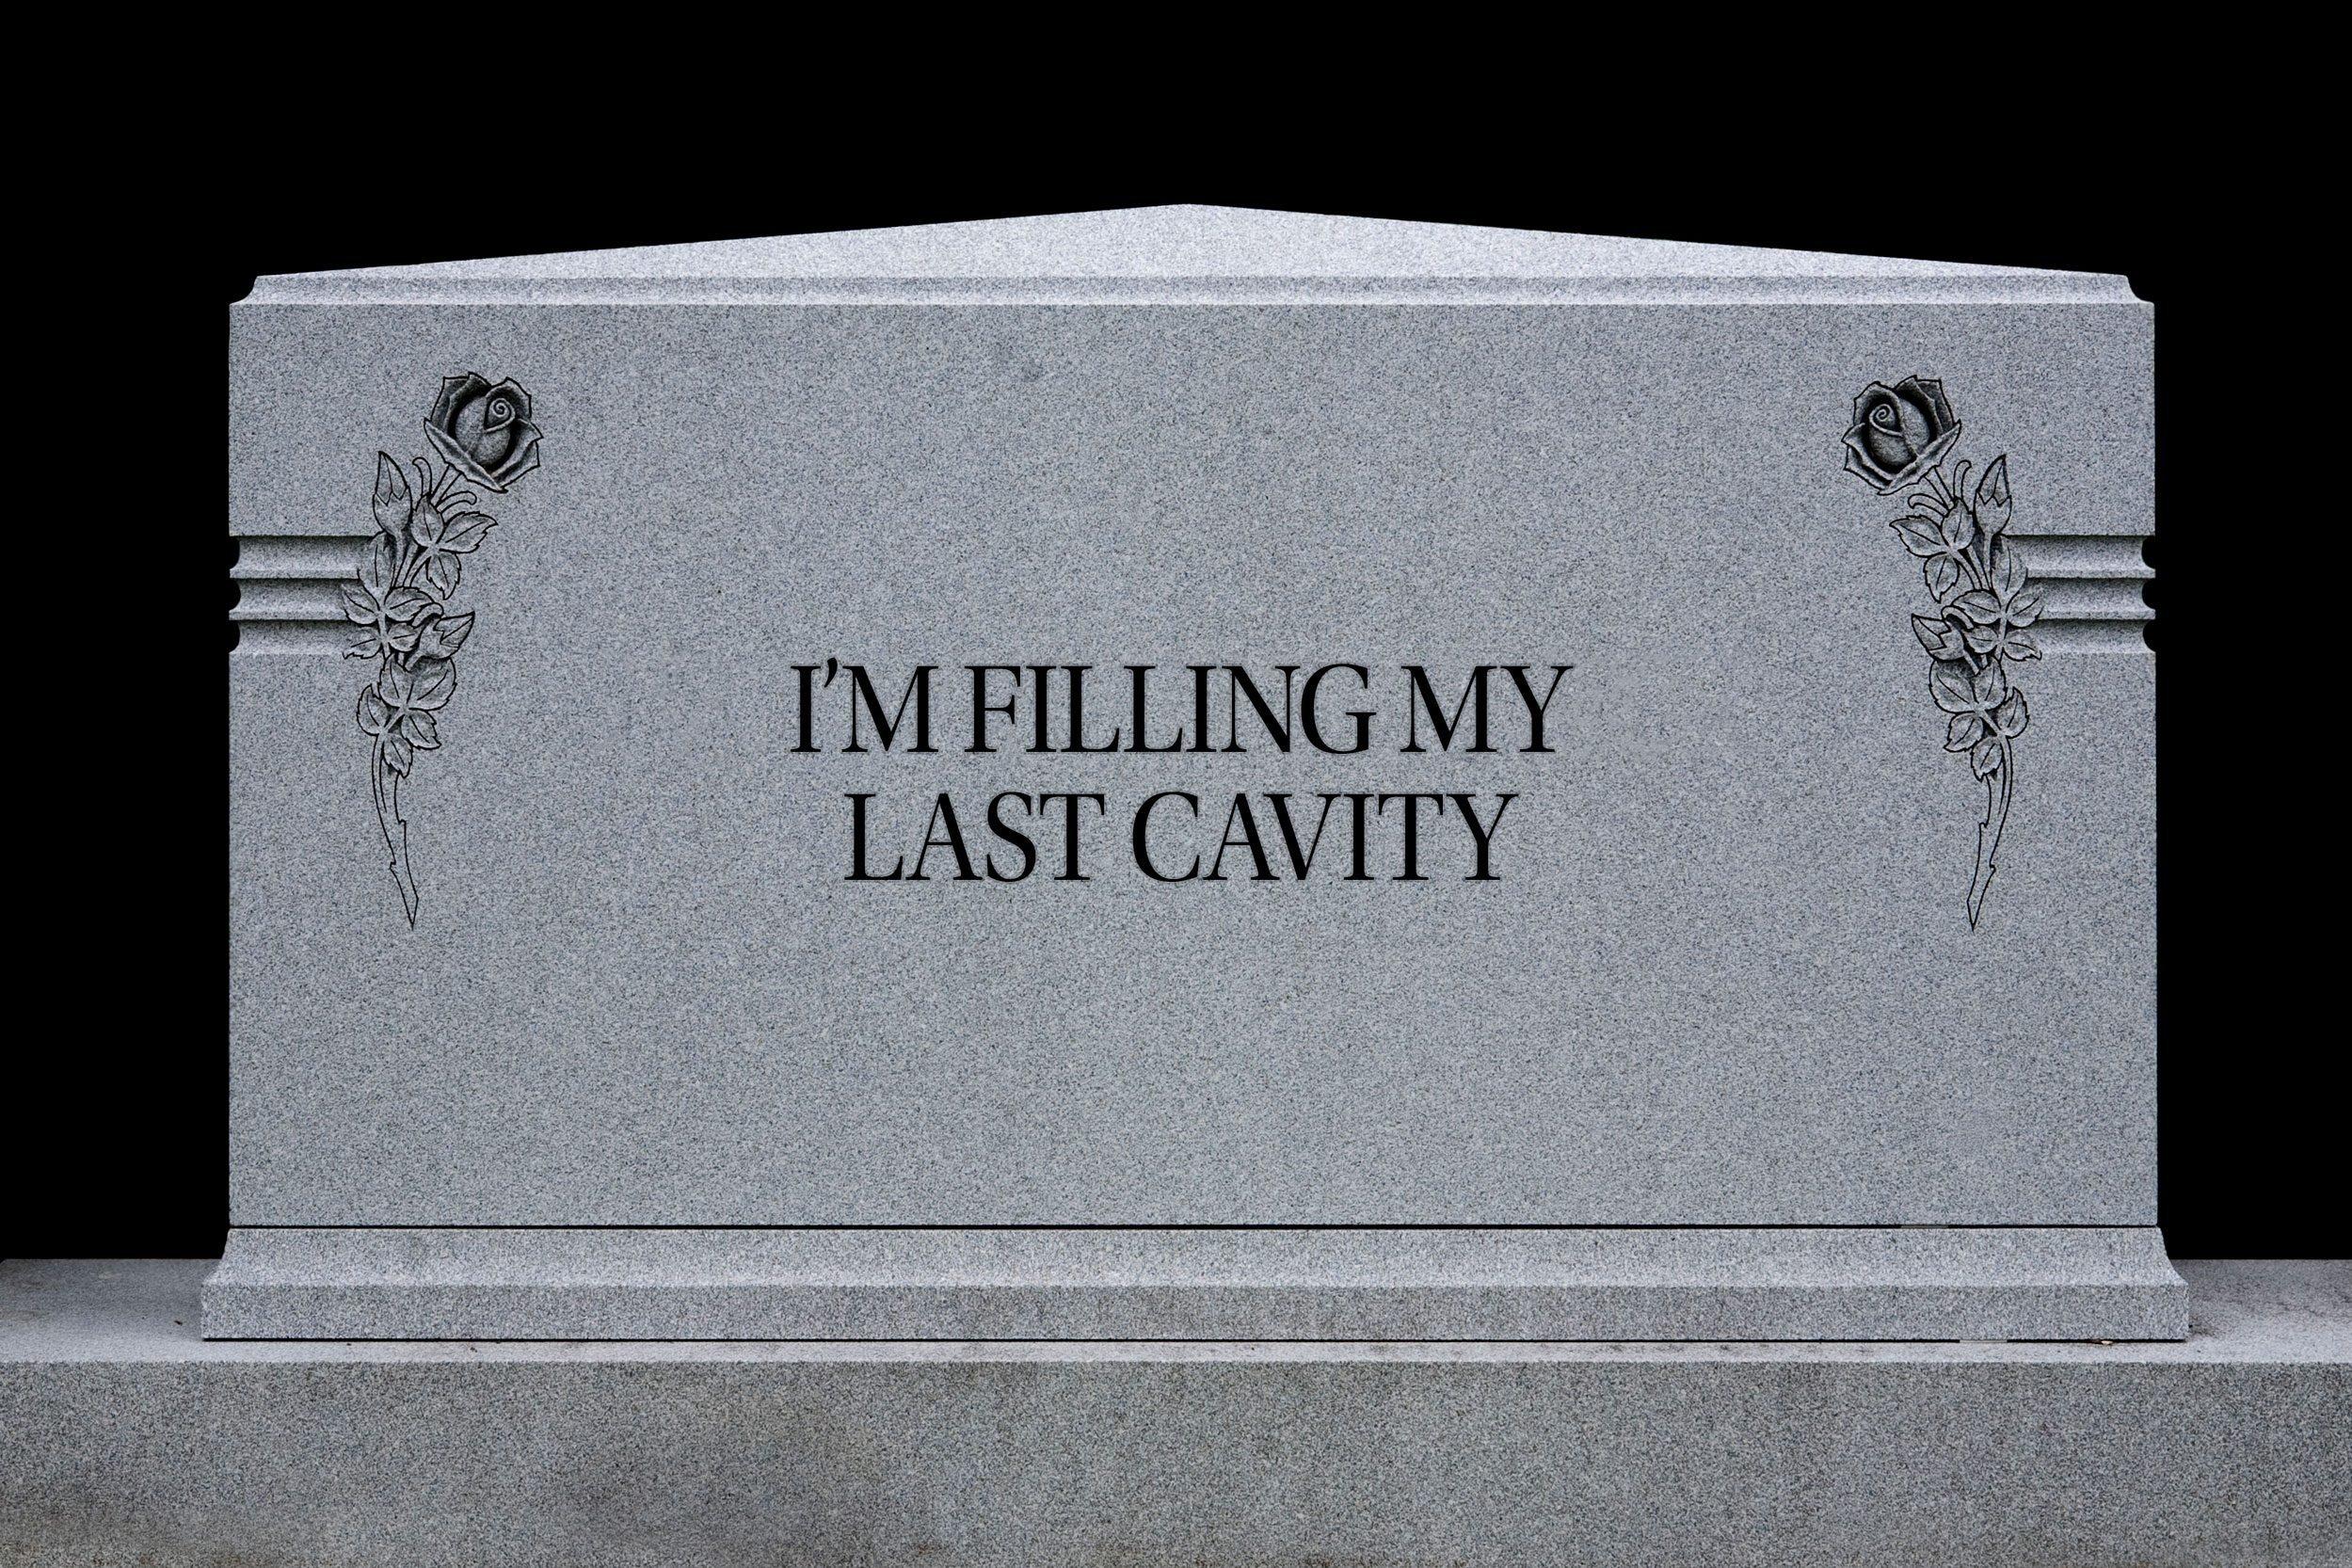 tombstone: I'm filling my last cavity